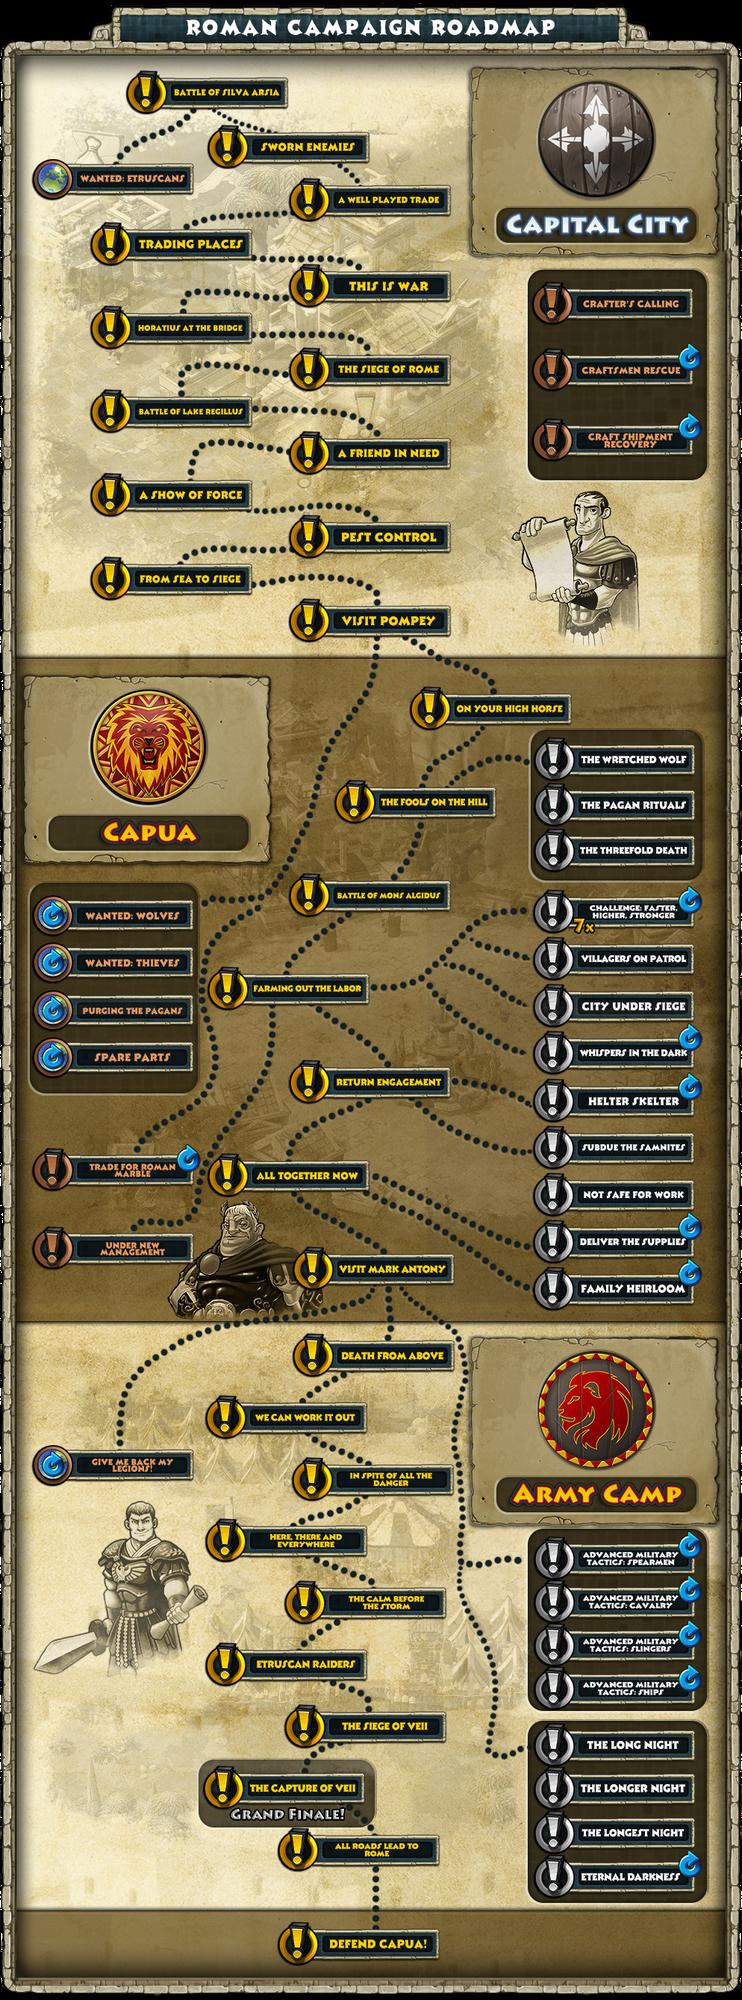 Roman_Campaign_Roadmap.png